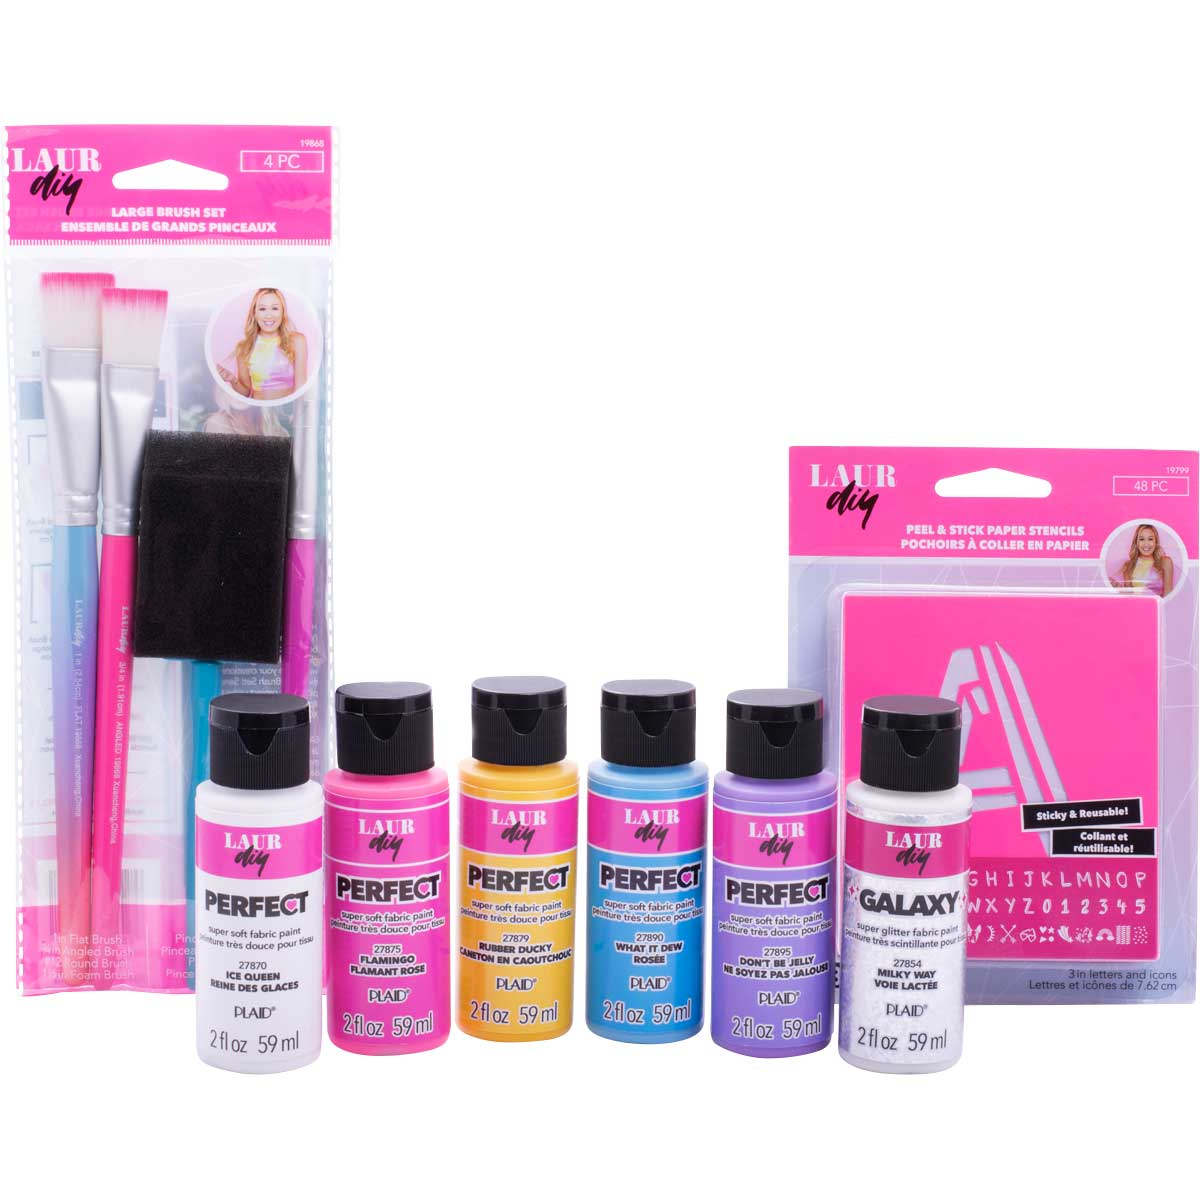 LaurDIY ® Fabric Paint, Stencil and Brush Kit - Unicorn Whimsy